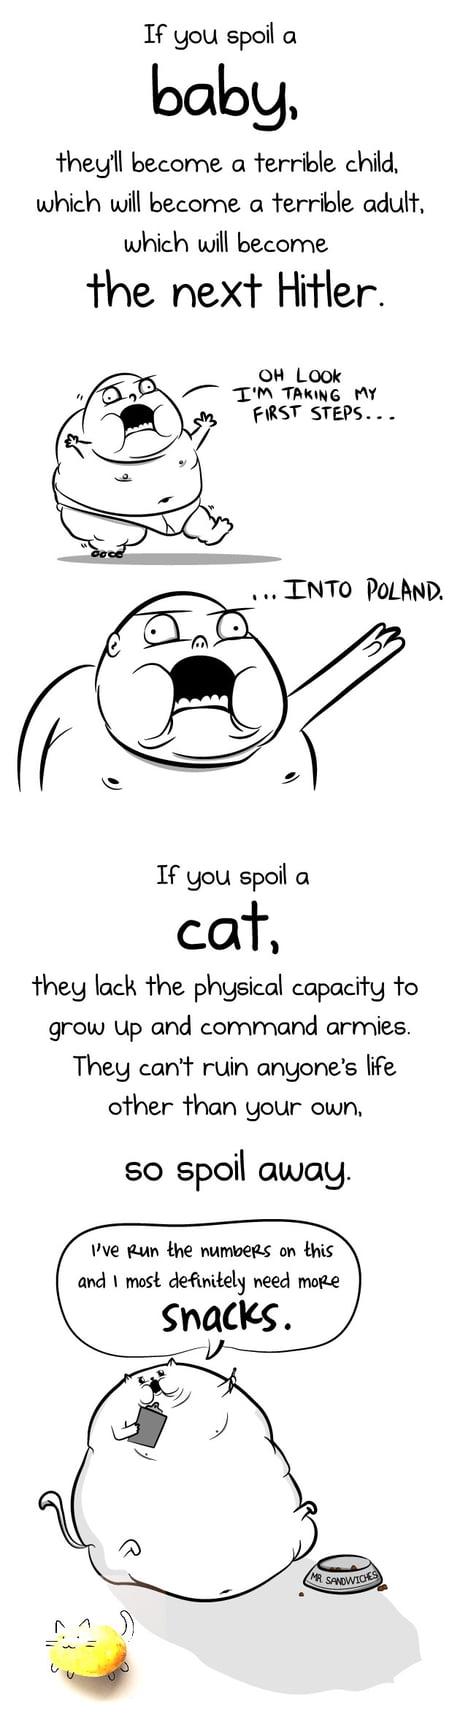 Cats>hooman babies